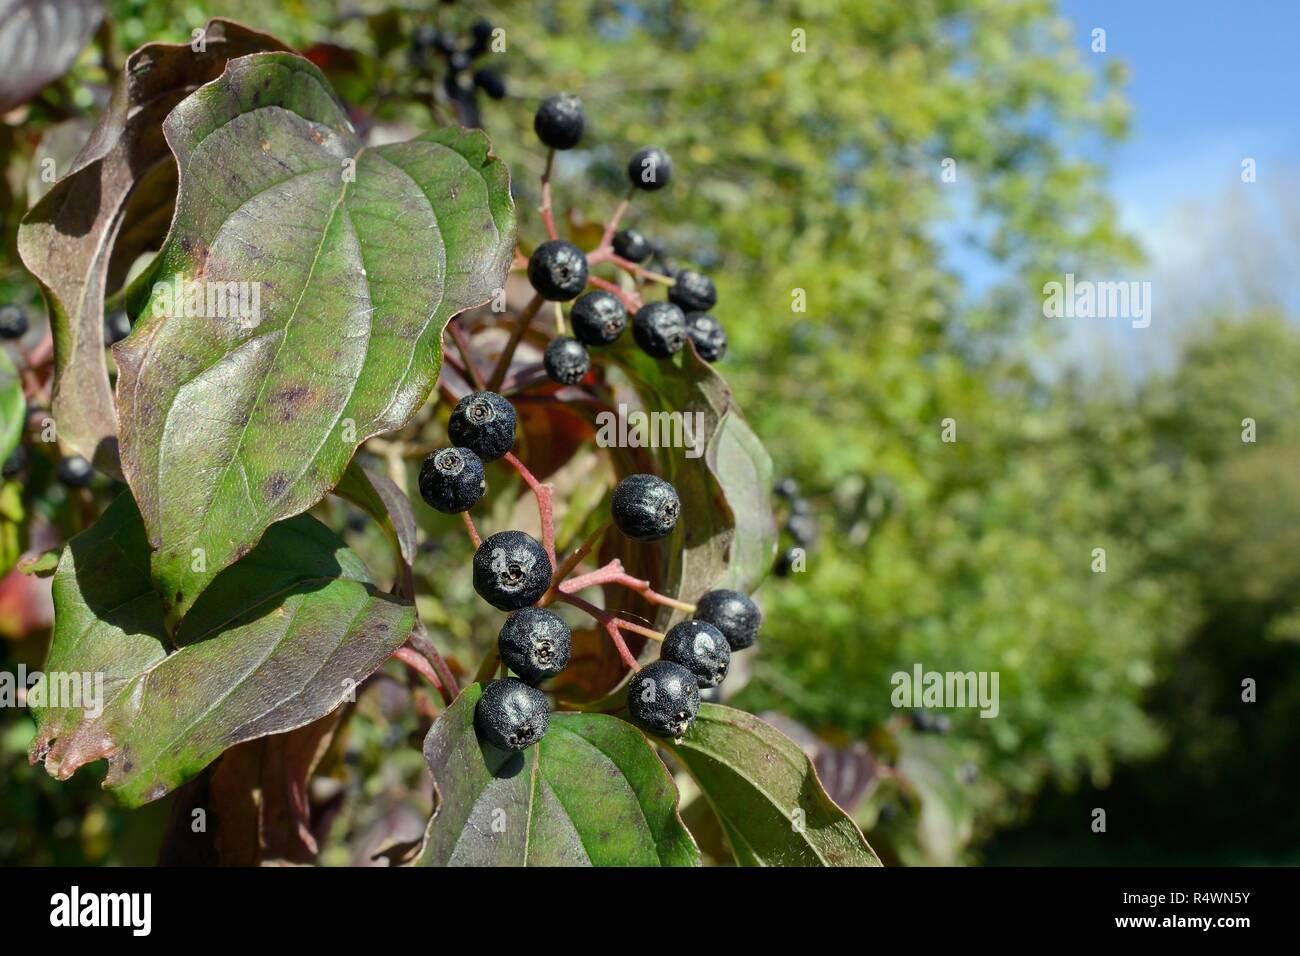 Dogwood (Cornus sanguinea), with ripe berries in woodland, Lower Woods, Gloucestershire, UK, October - Stock Image